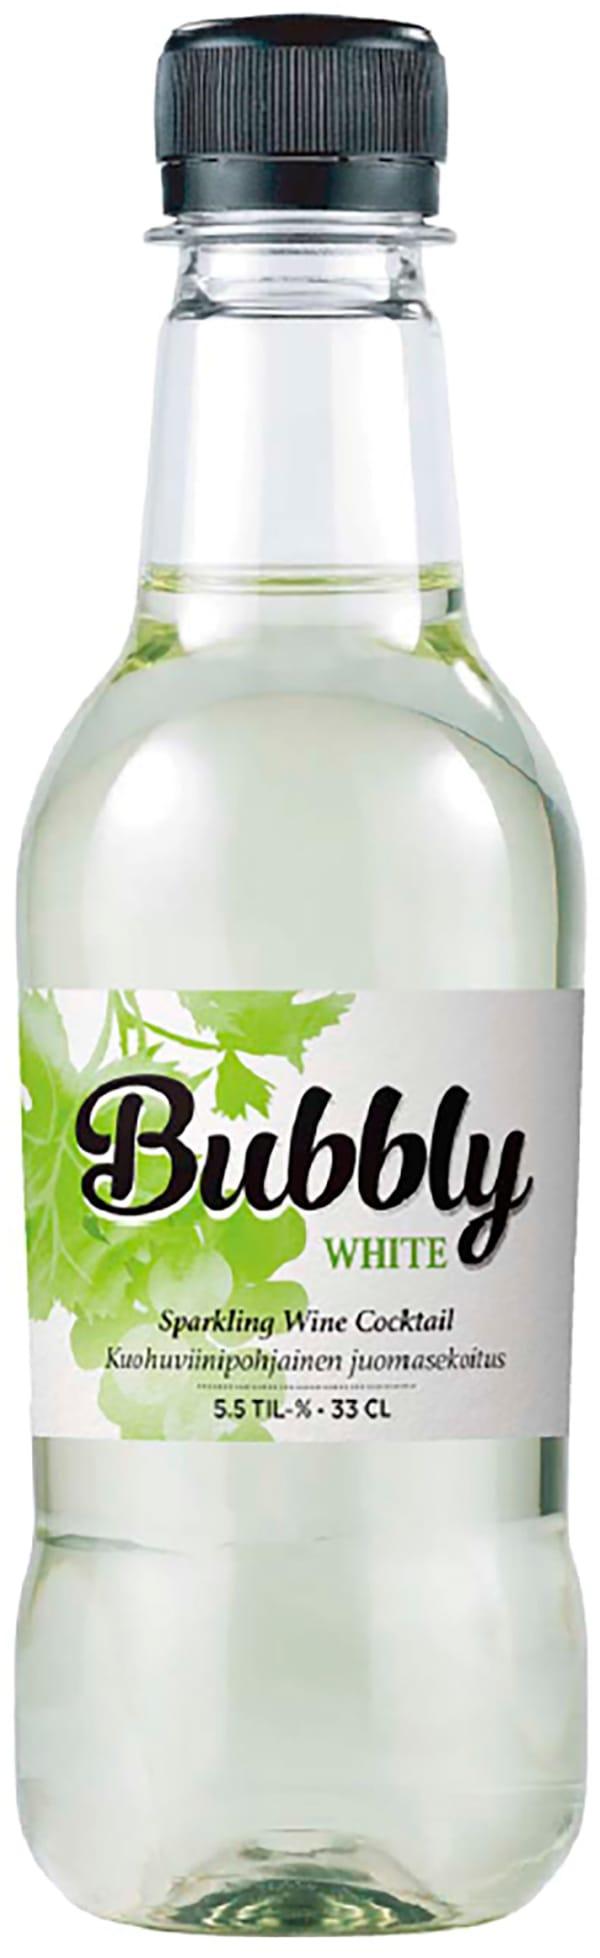 Bubbly White plastic bottle